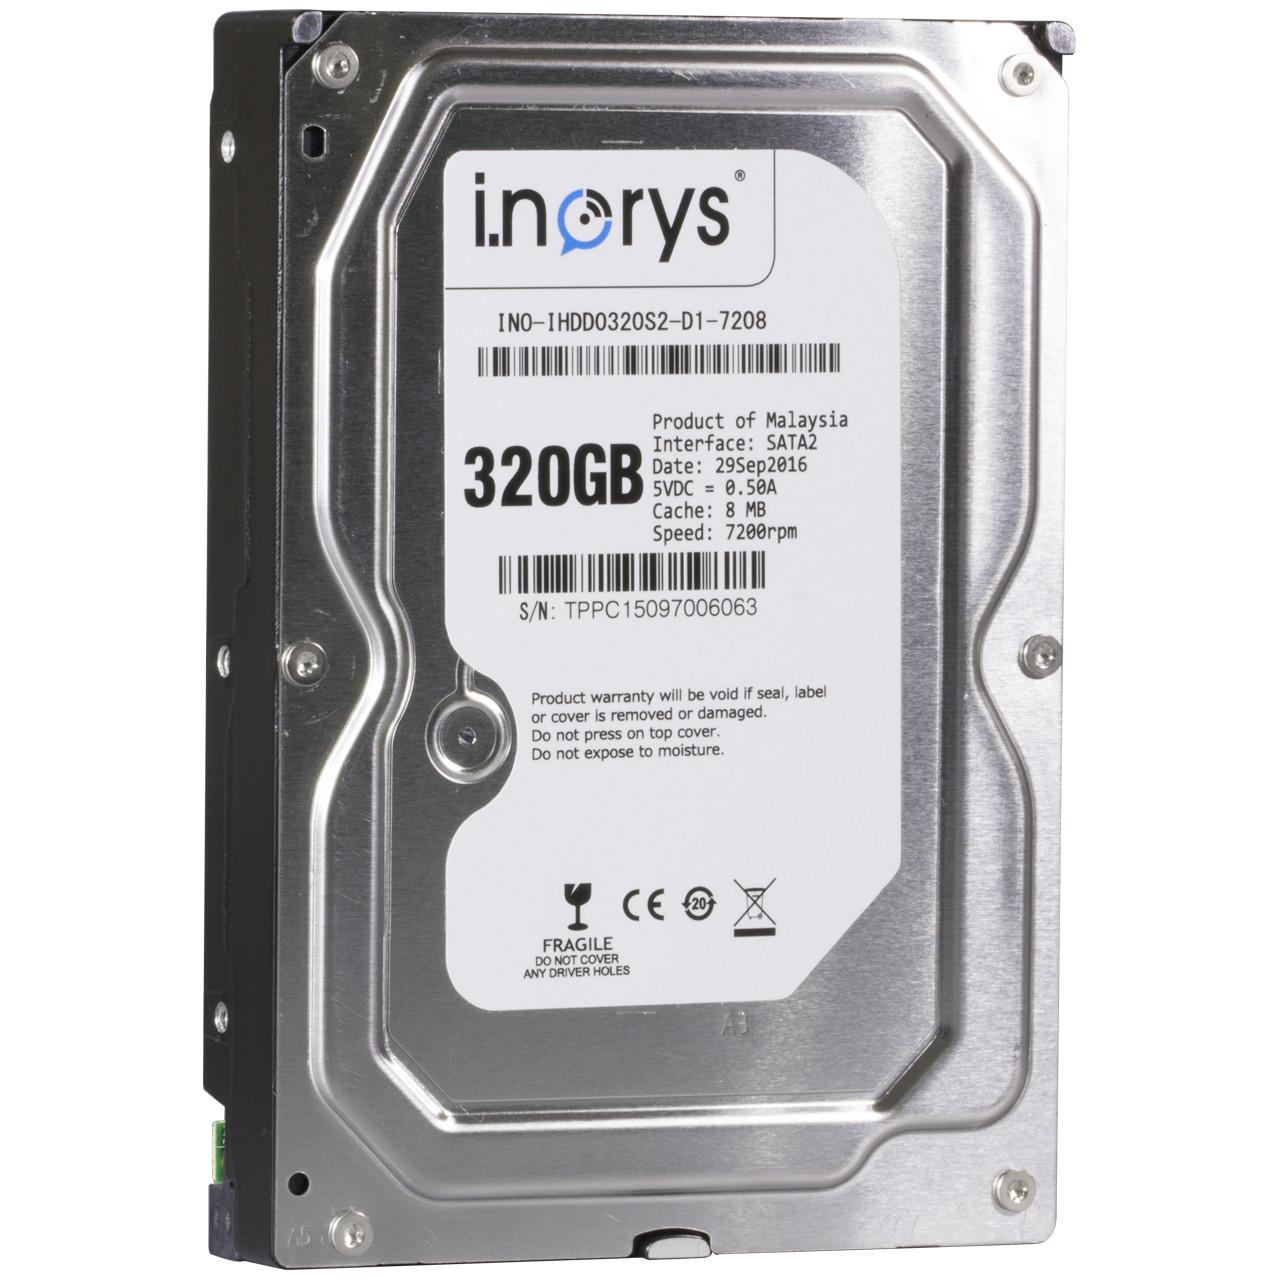 ➘Жесткий диск i.norys 320GB 7200rpm 8MB (INO-IHDD0320S2-D1-7208) HDD SATA II быстрый игровой